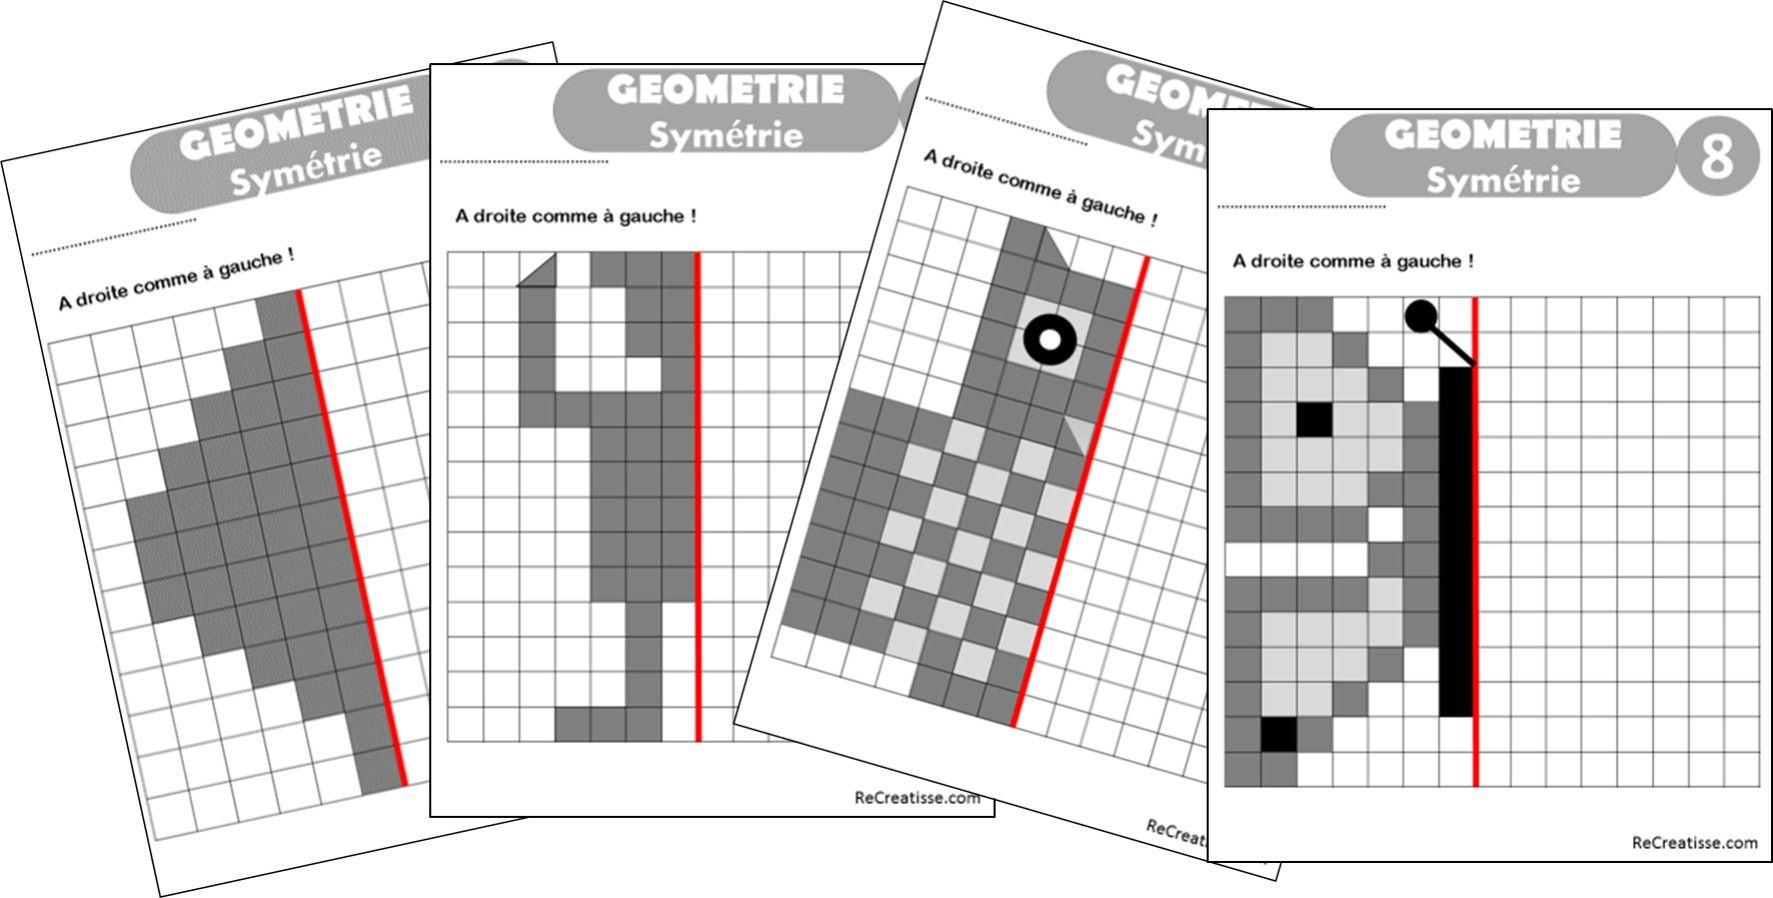 Geometrie : Ateliers Symétrie Et Exercices | Géométrie, Axe avec Exercice Symétrie Ce1